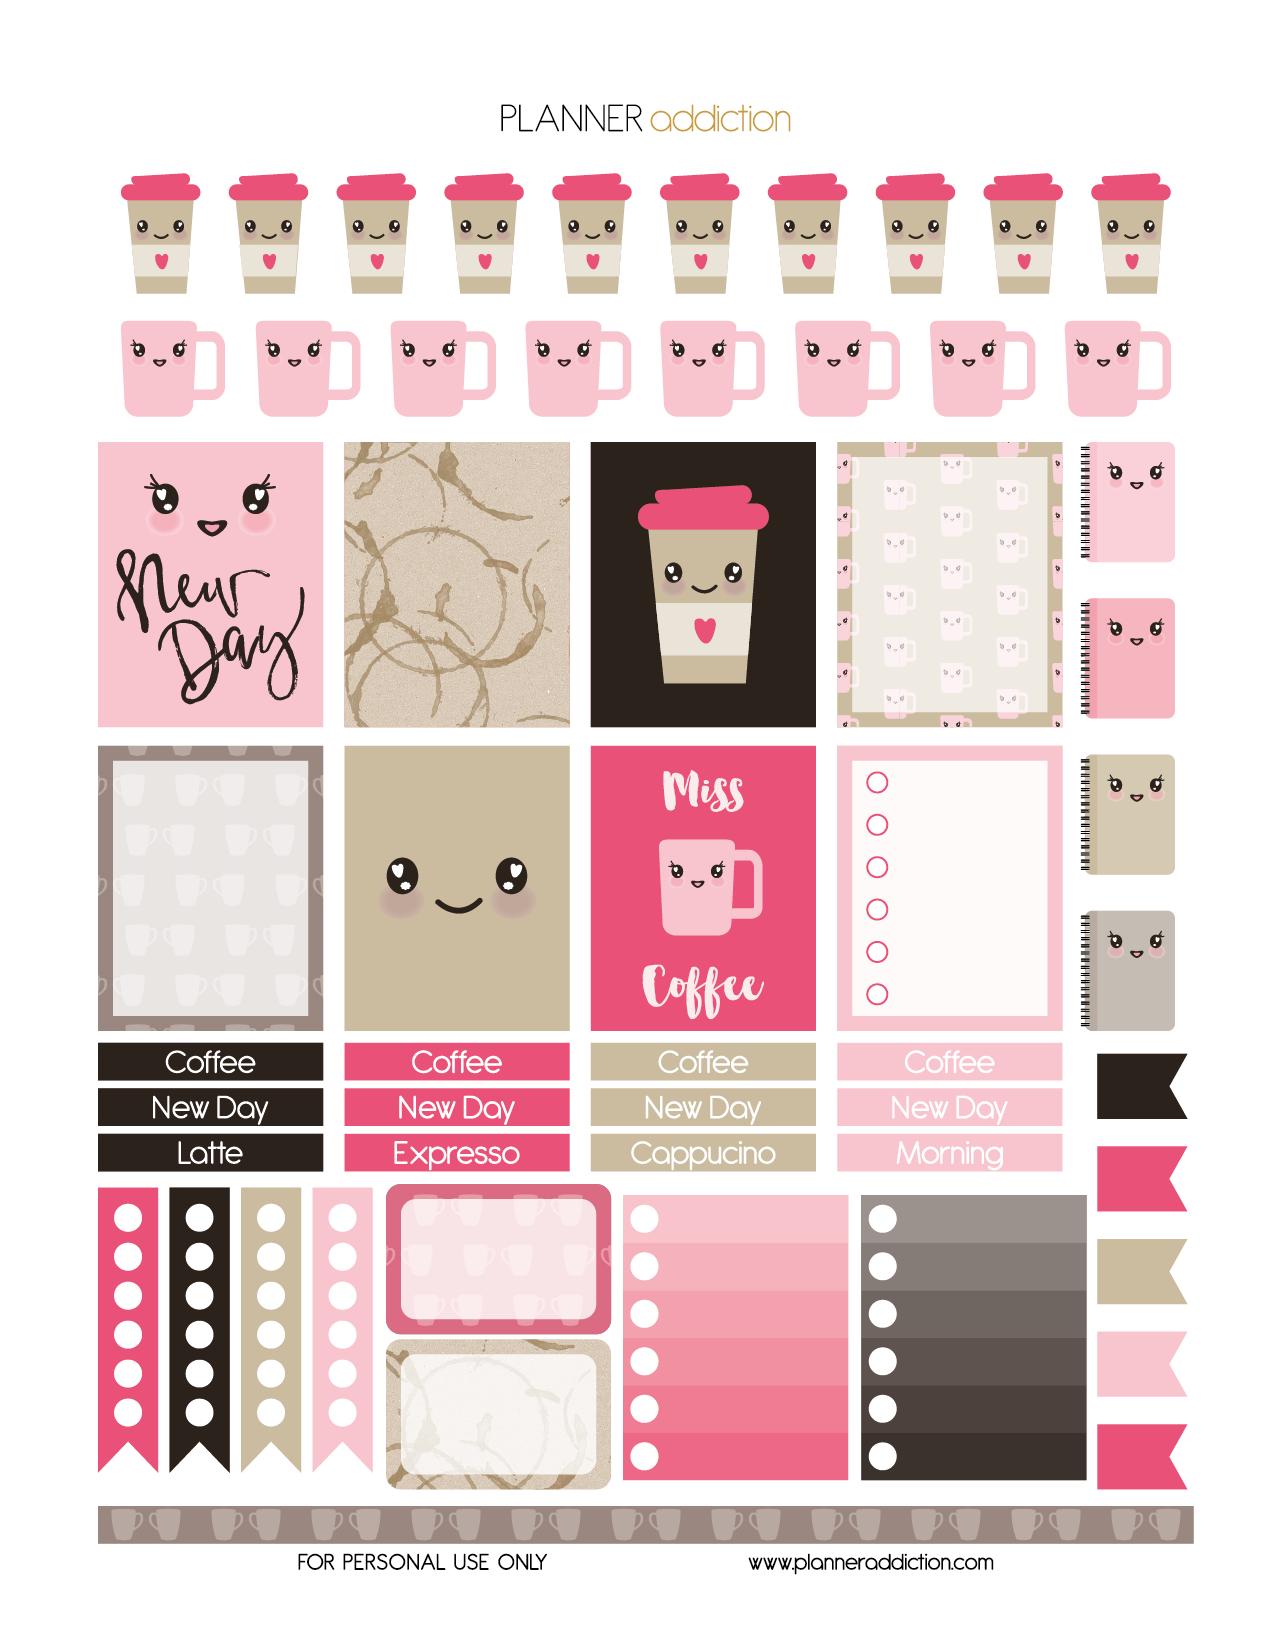 Coffee Kawaii – Planner Addiction - Free Printable Kawaii Stickers